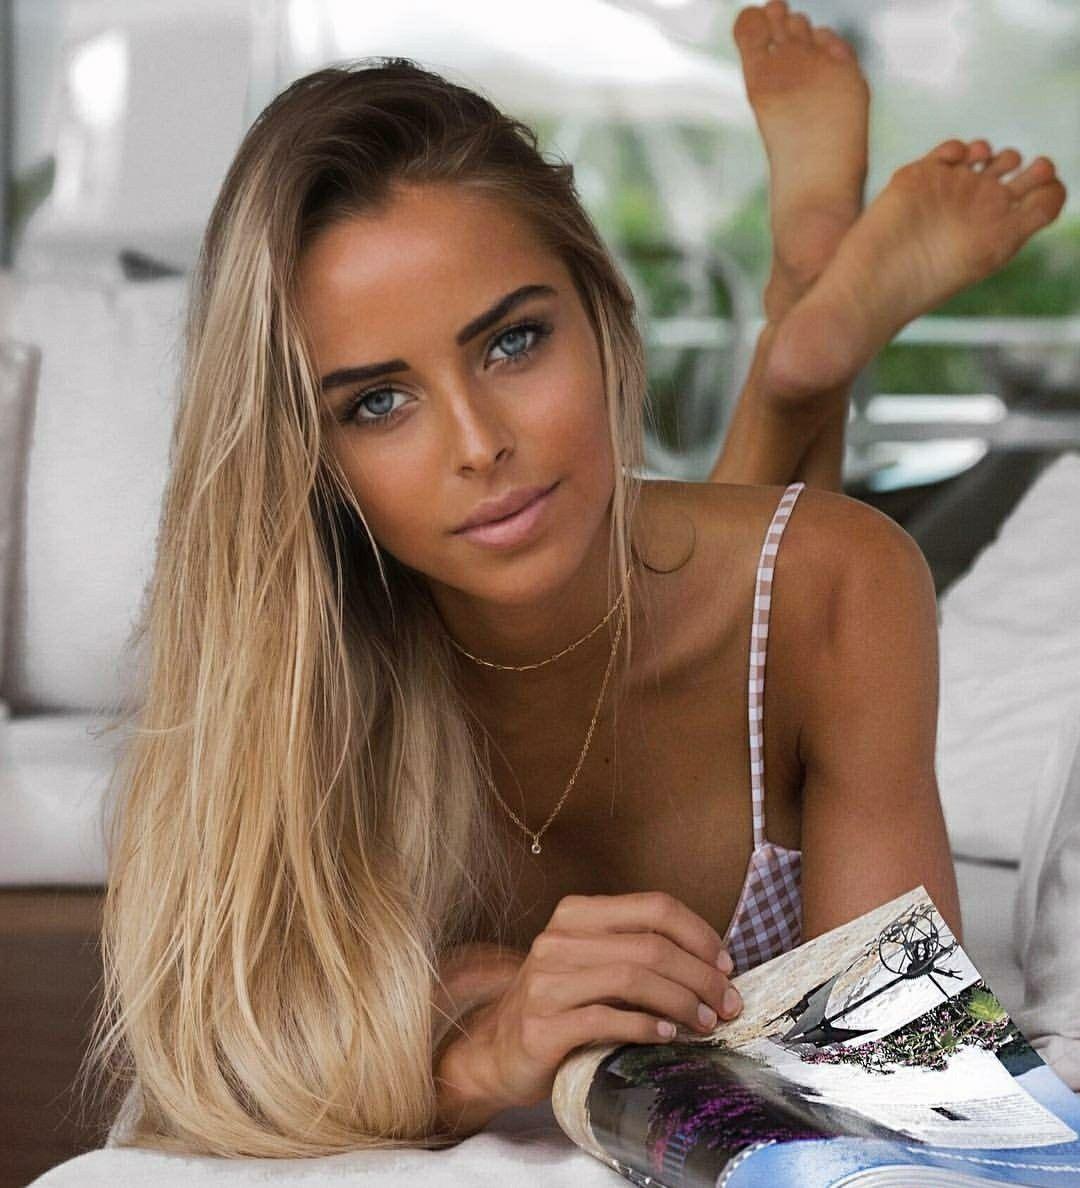 Chiara Bransi nude (74 fotos), pics Selfie, Snapchat, underwear 2015